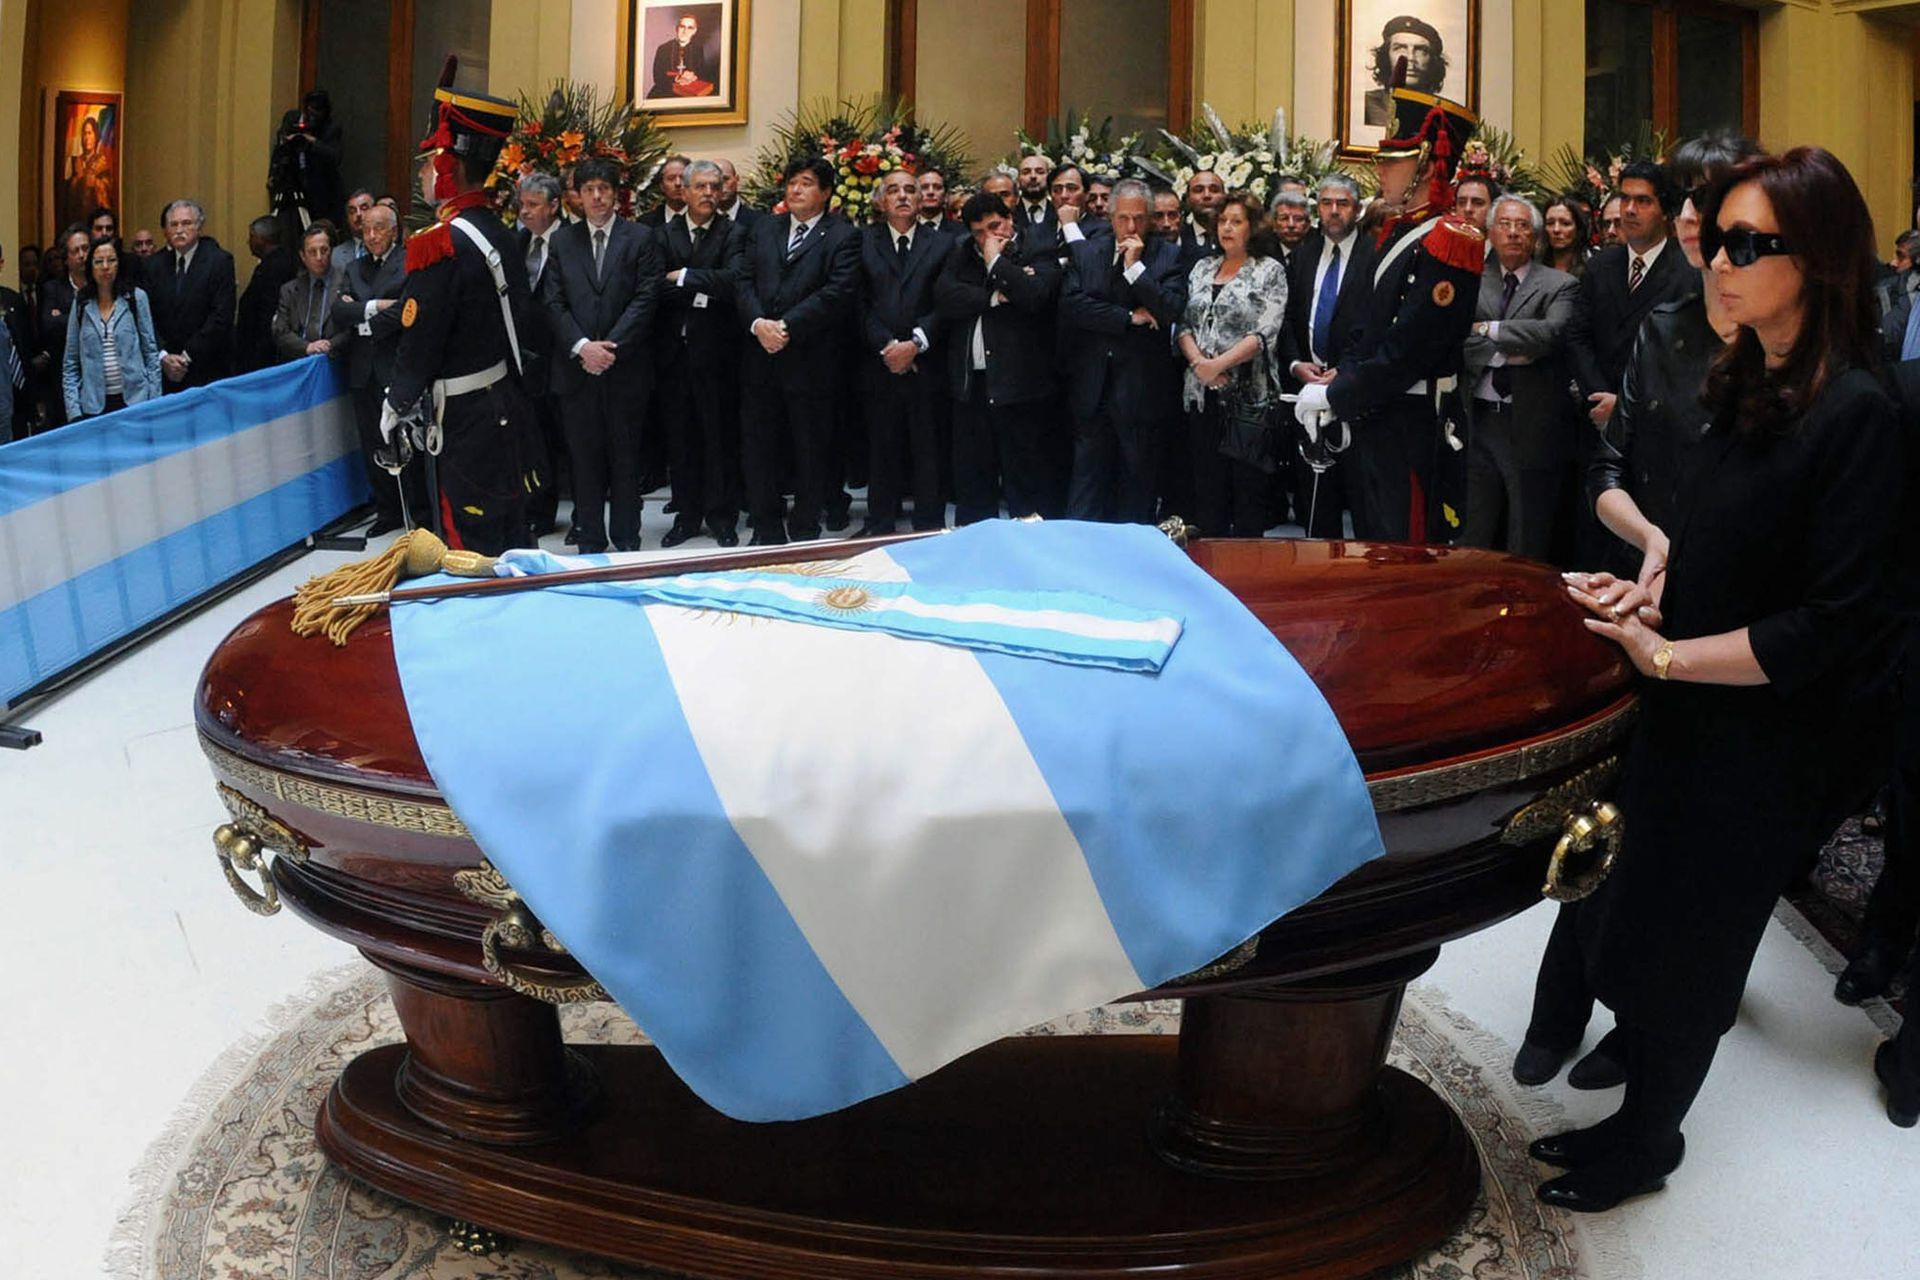 La presidenta Cristina Kirchner se despide de su marido, Néstor Kirchner